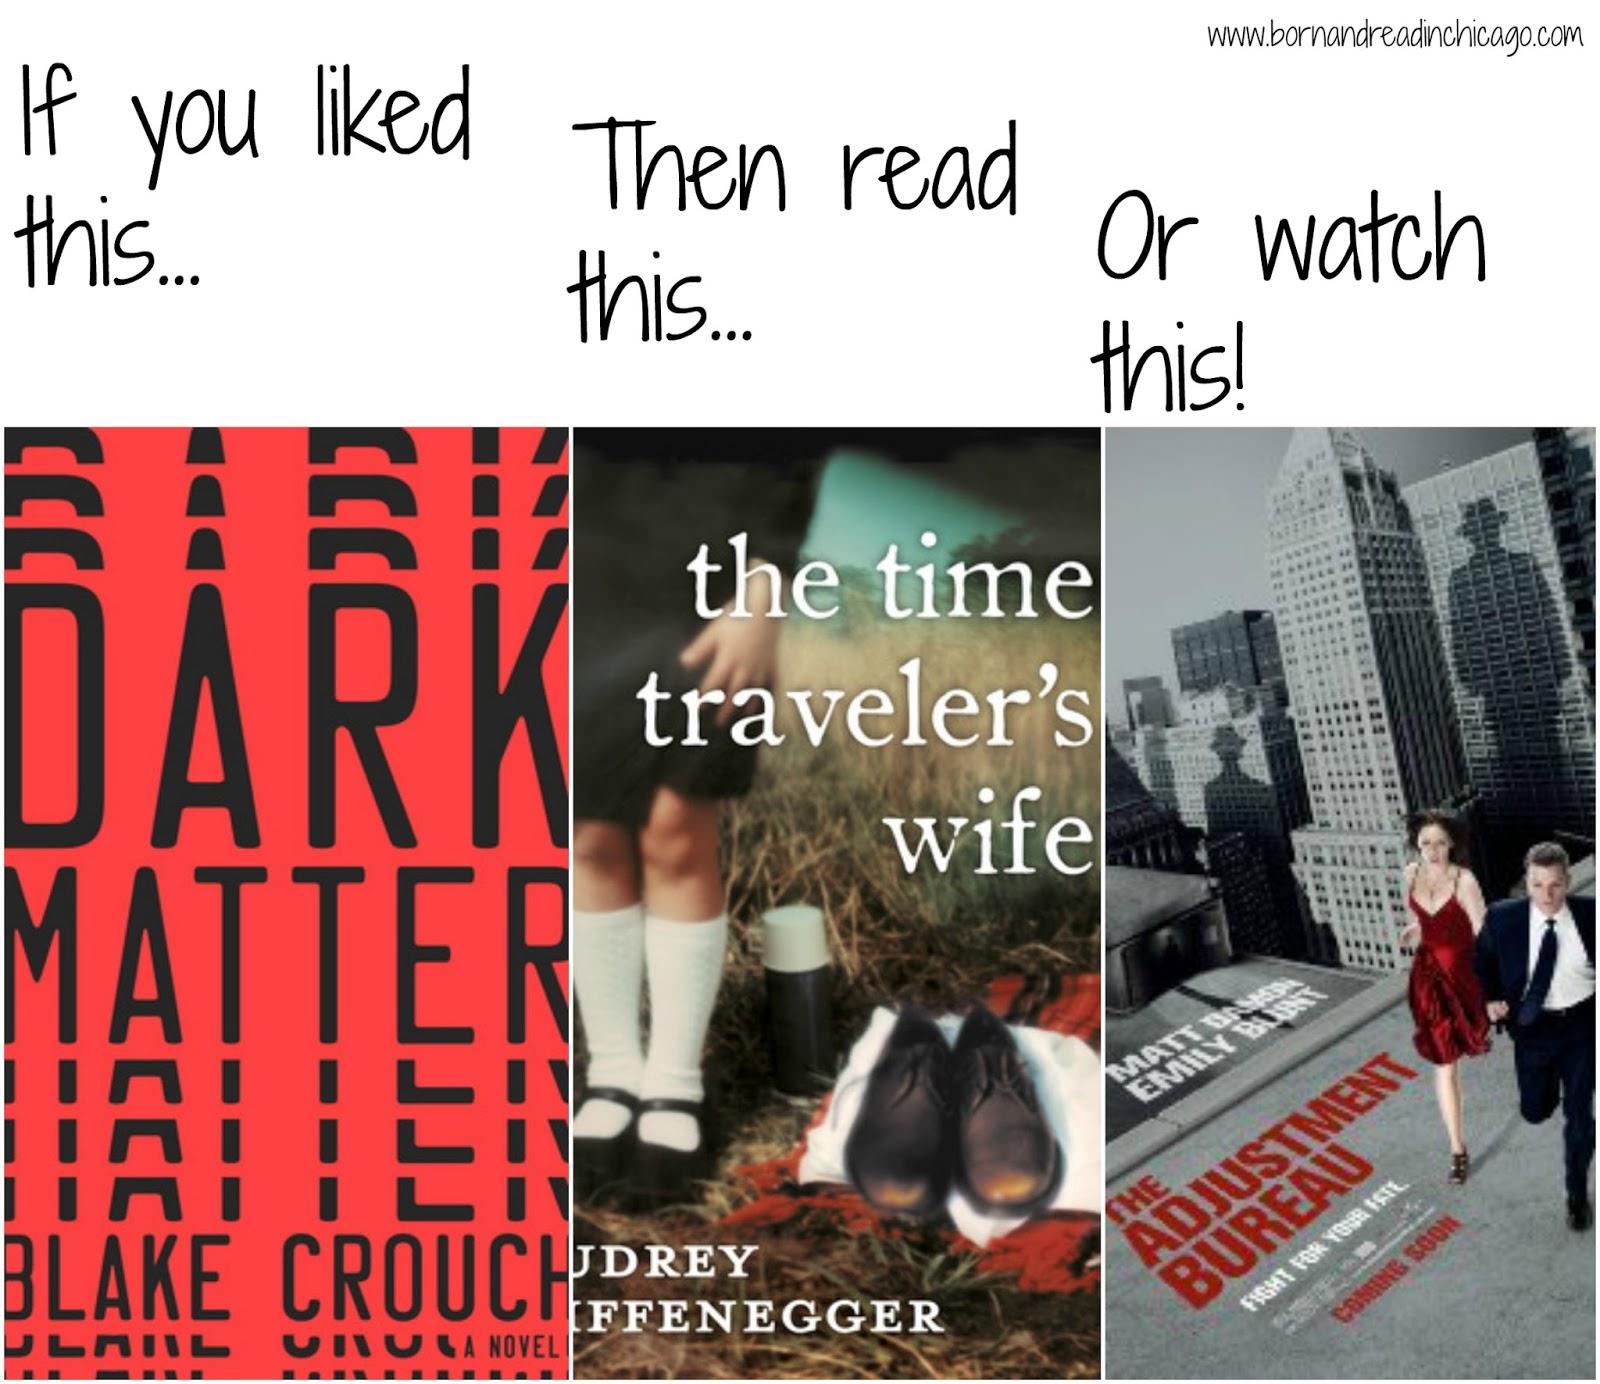 Dark Matter by Blake Crouch 1st Edition HARDCOVER Novel Book 2016